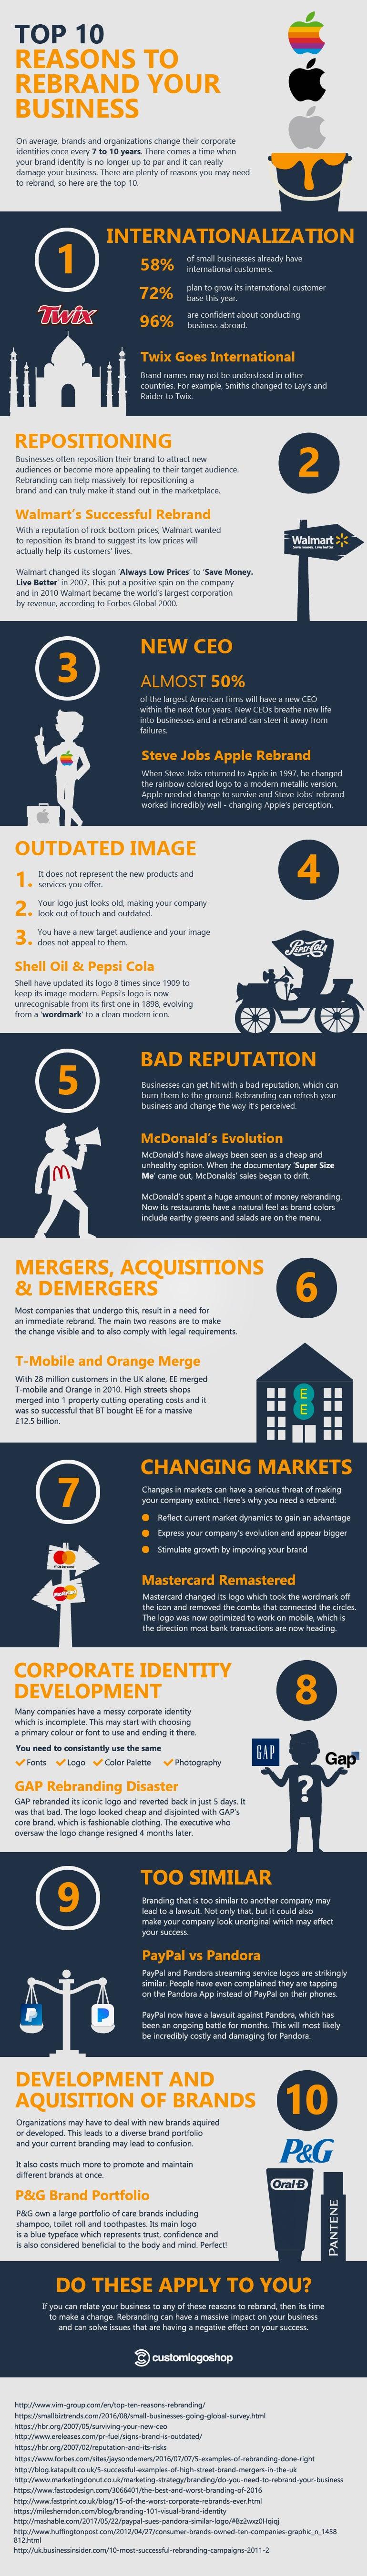 https://assets.entrepreneur.com/images/misc/1524235416_reasons-rebrand-business-infographic.jpg